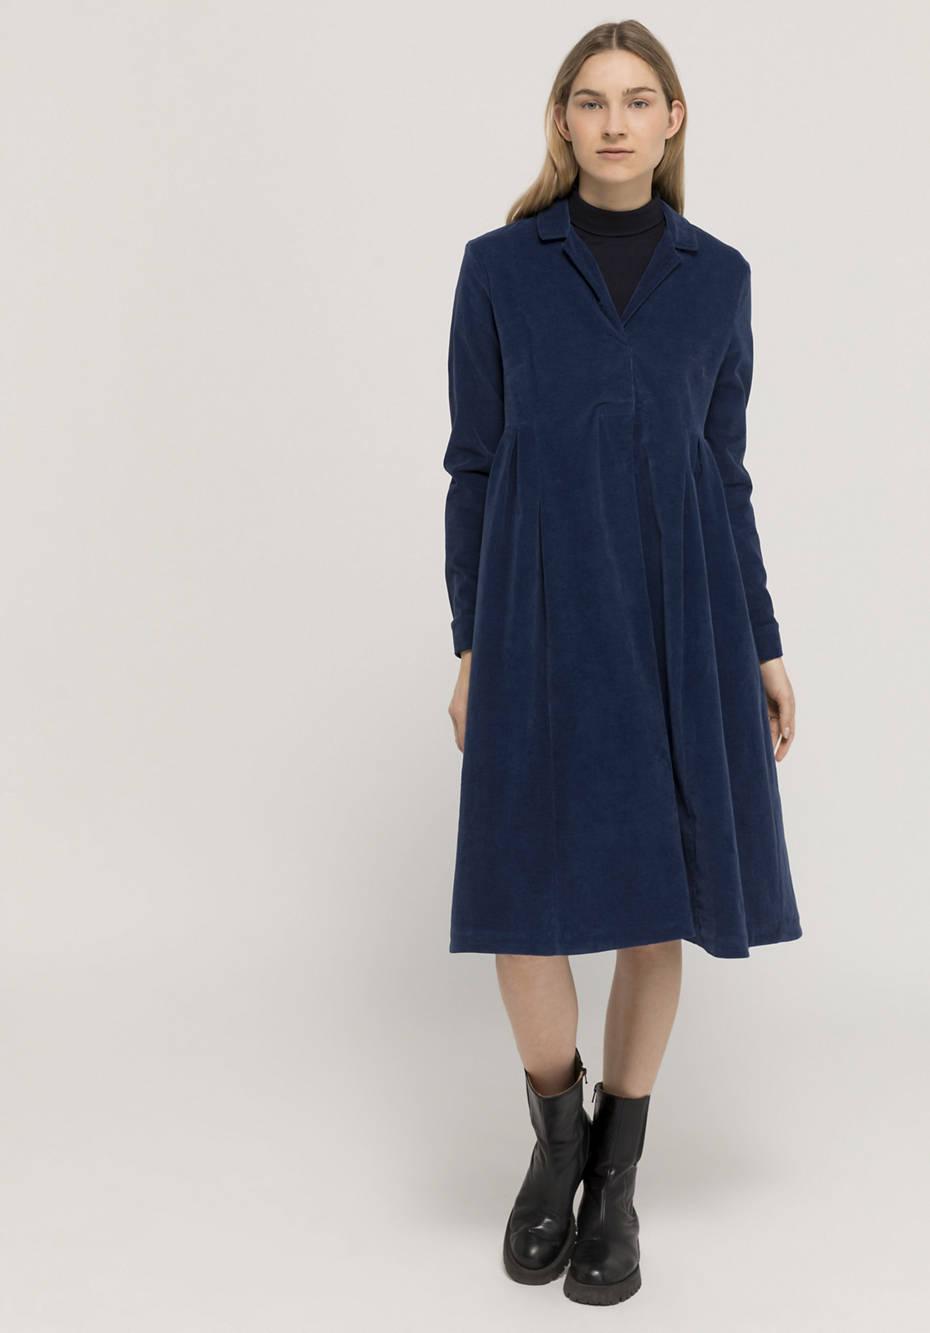 Cord dress made of organic cotton with hemp